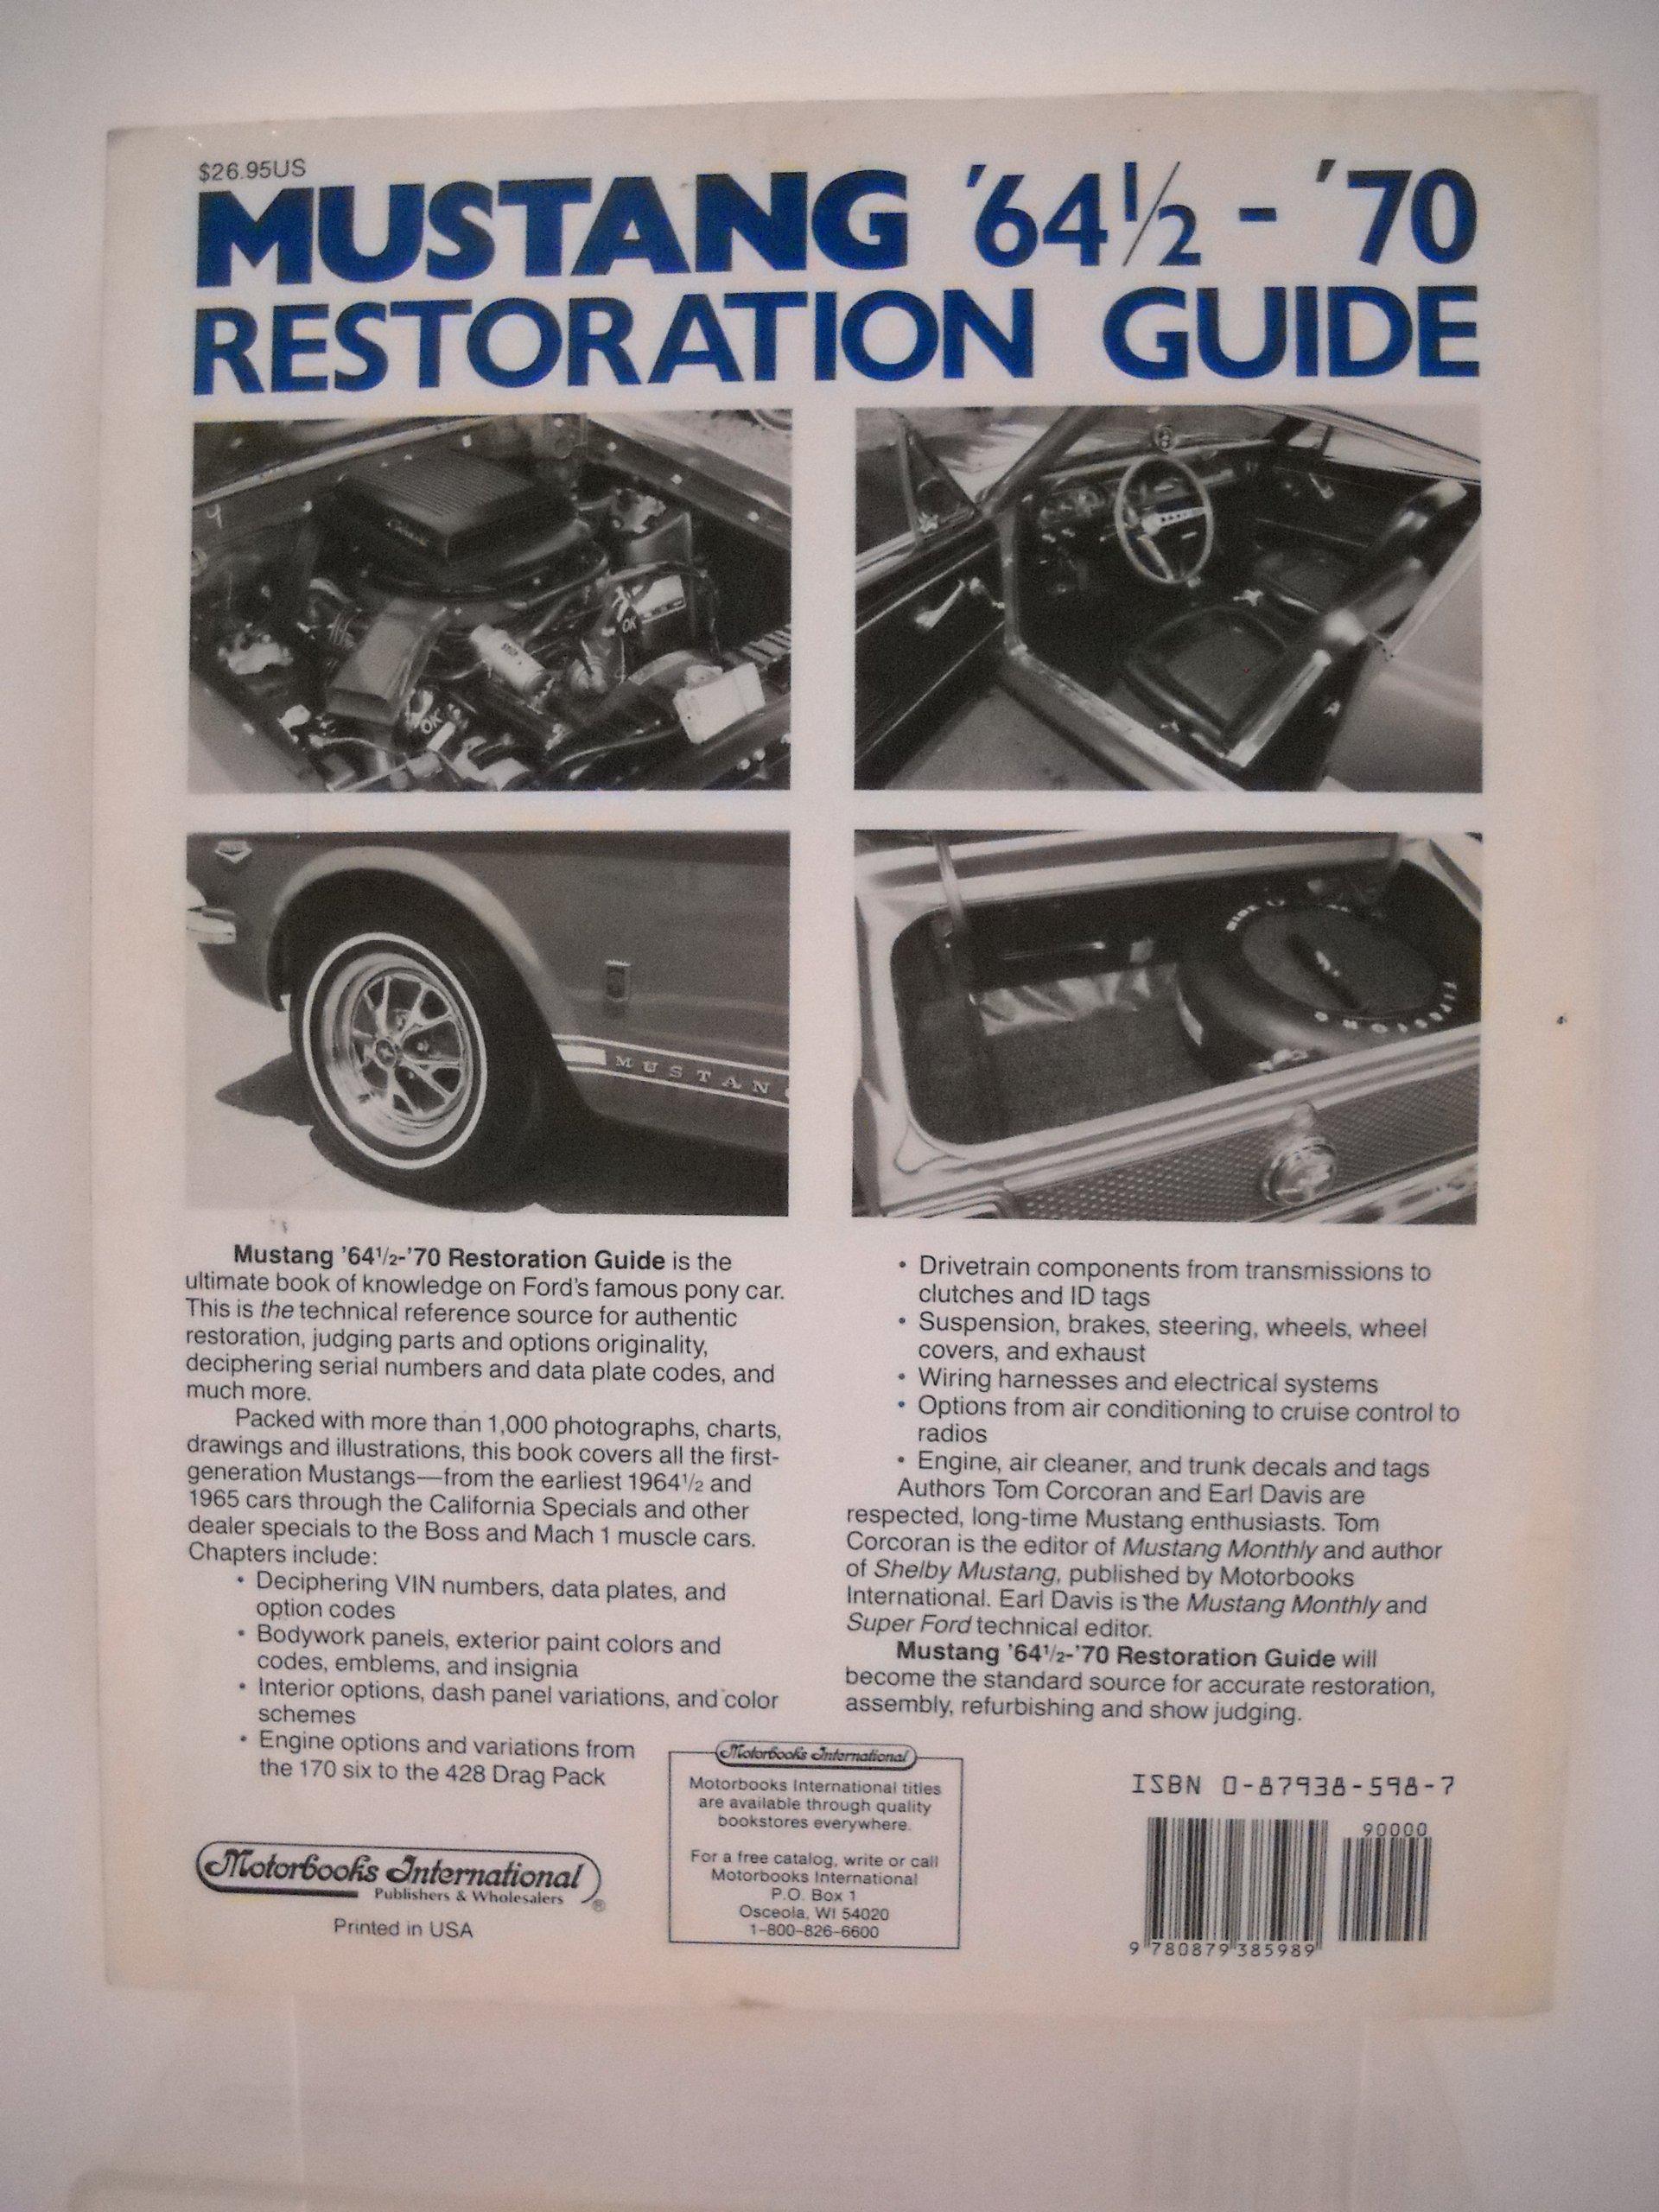 Mustang 64 12 70 restoration guide motorbooks international mustang 64 12 70 restoration guide motorbooks international authentic restoration guides tom corcoran earl davis 9780879385989 amazon books fandeluxe Image collections